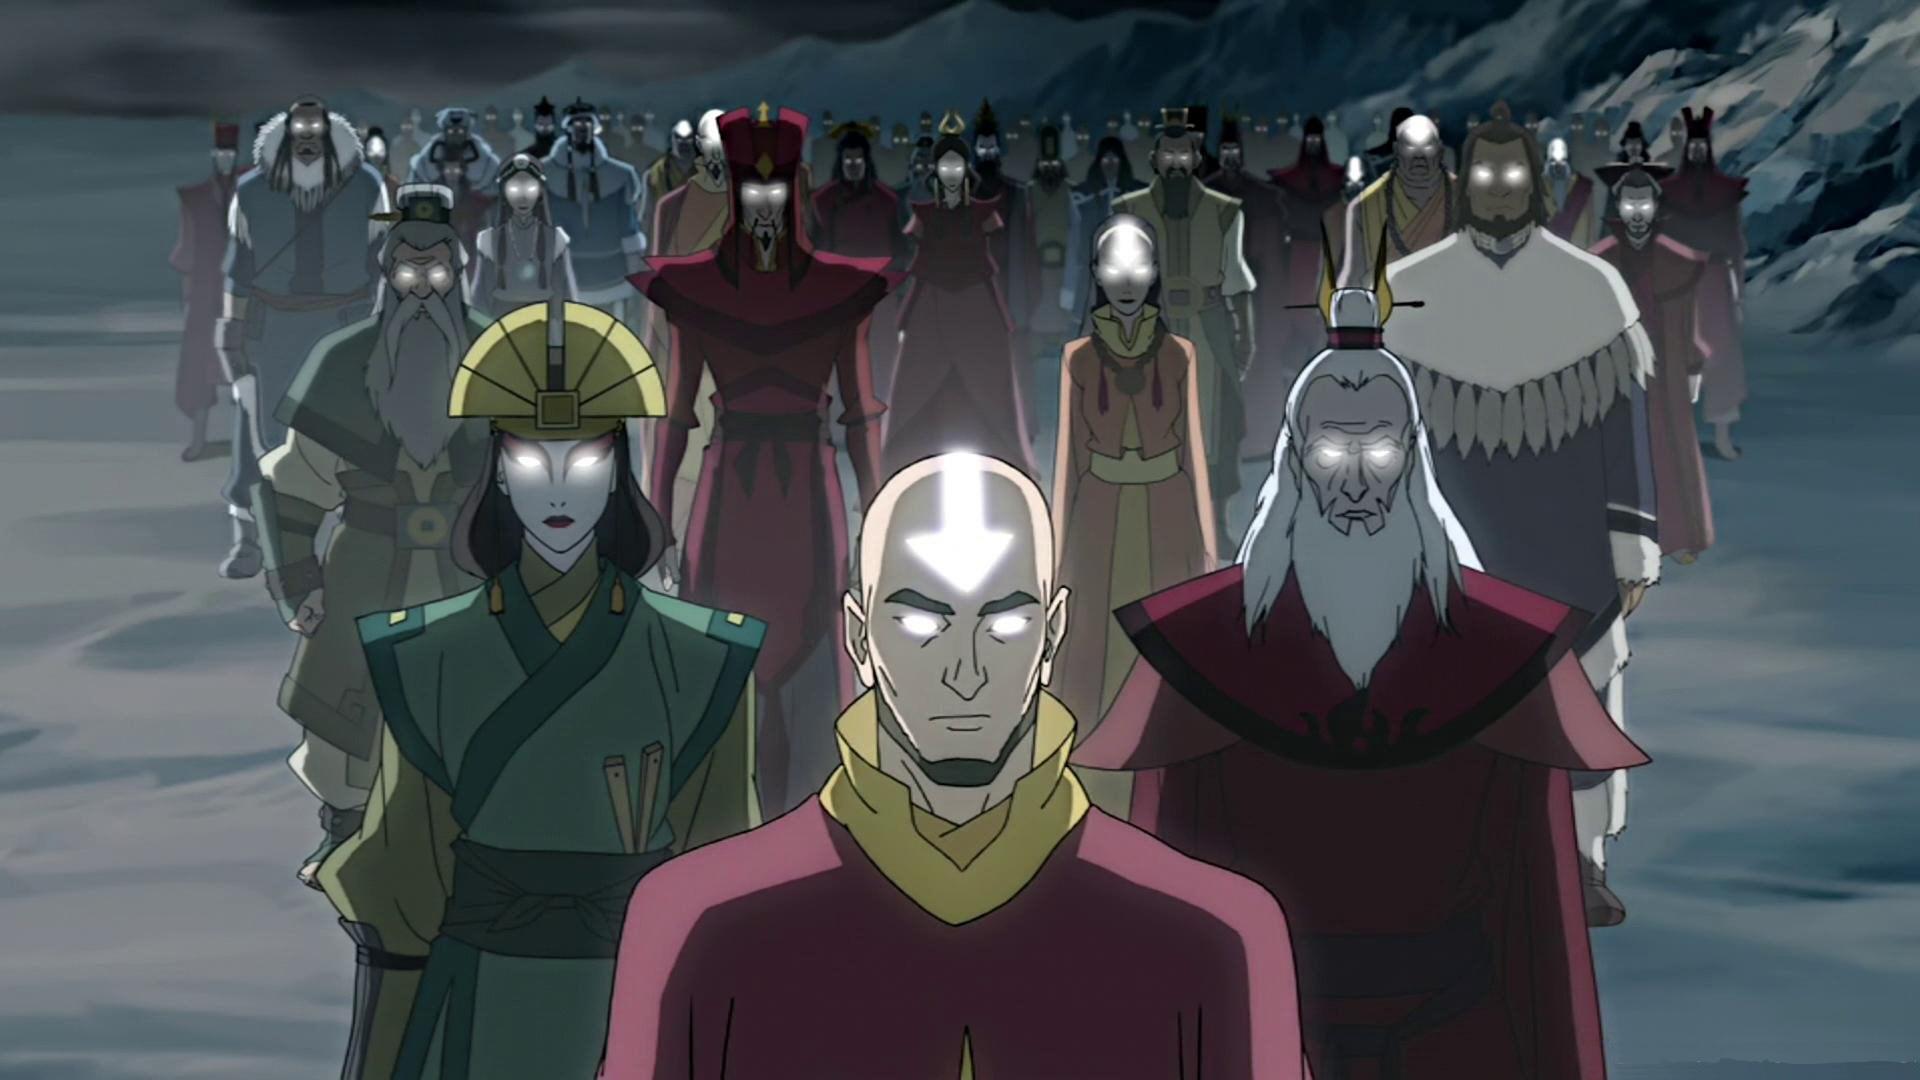 Avatar The Last Airbender Hd Wallpaper 2439413 Zerochan Anime